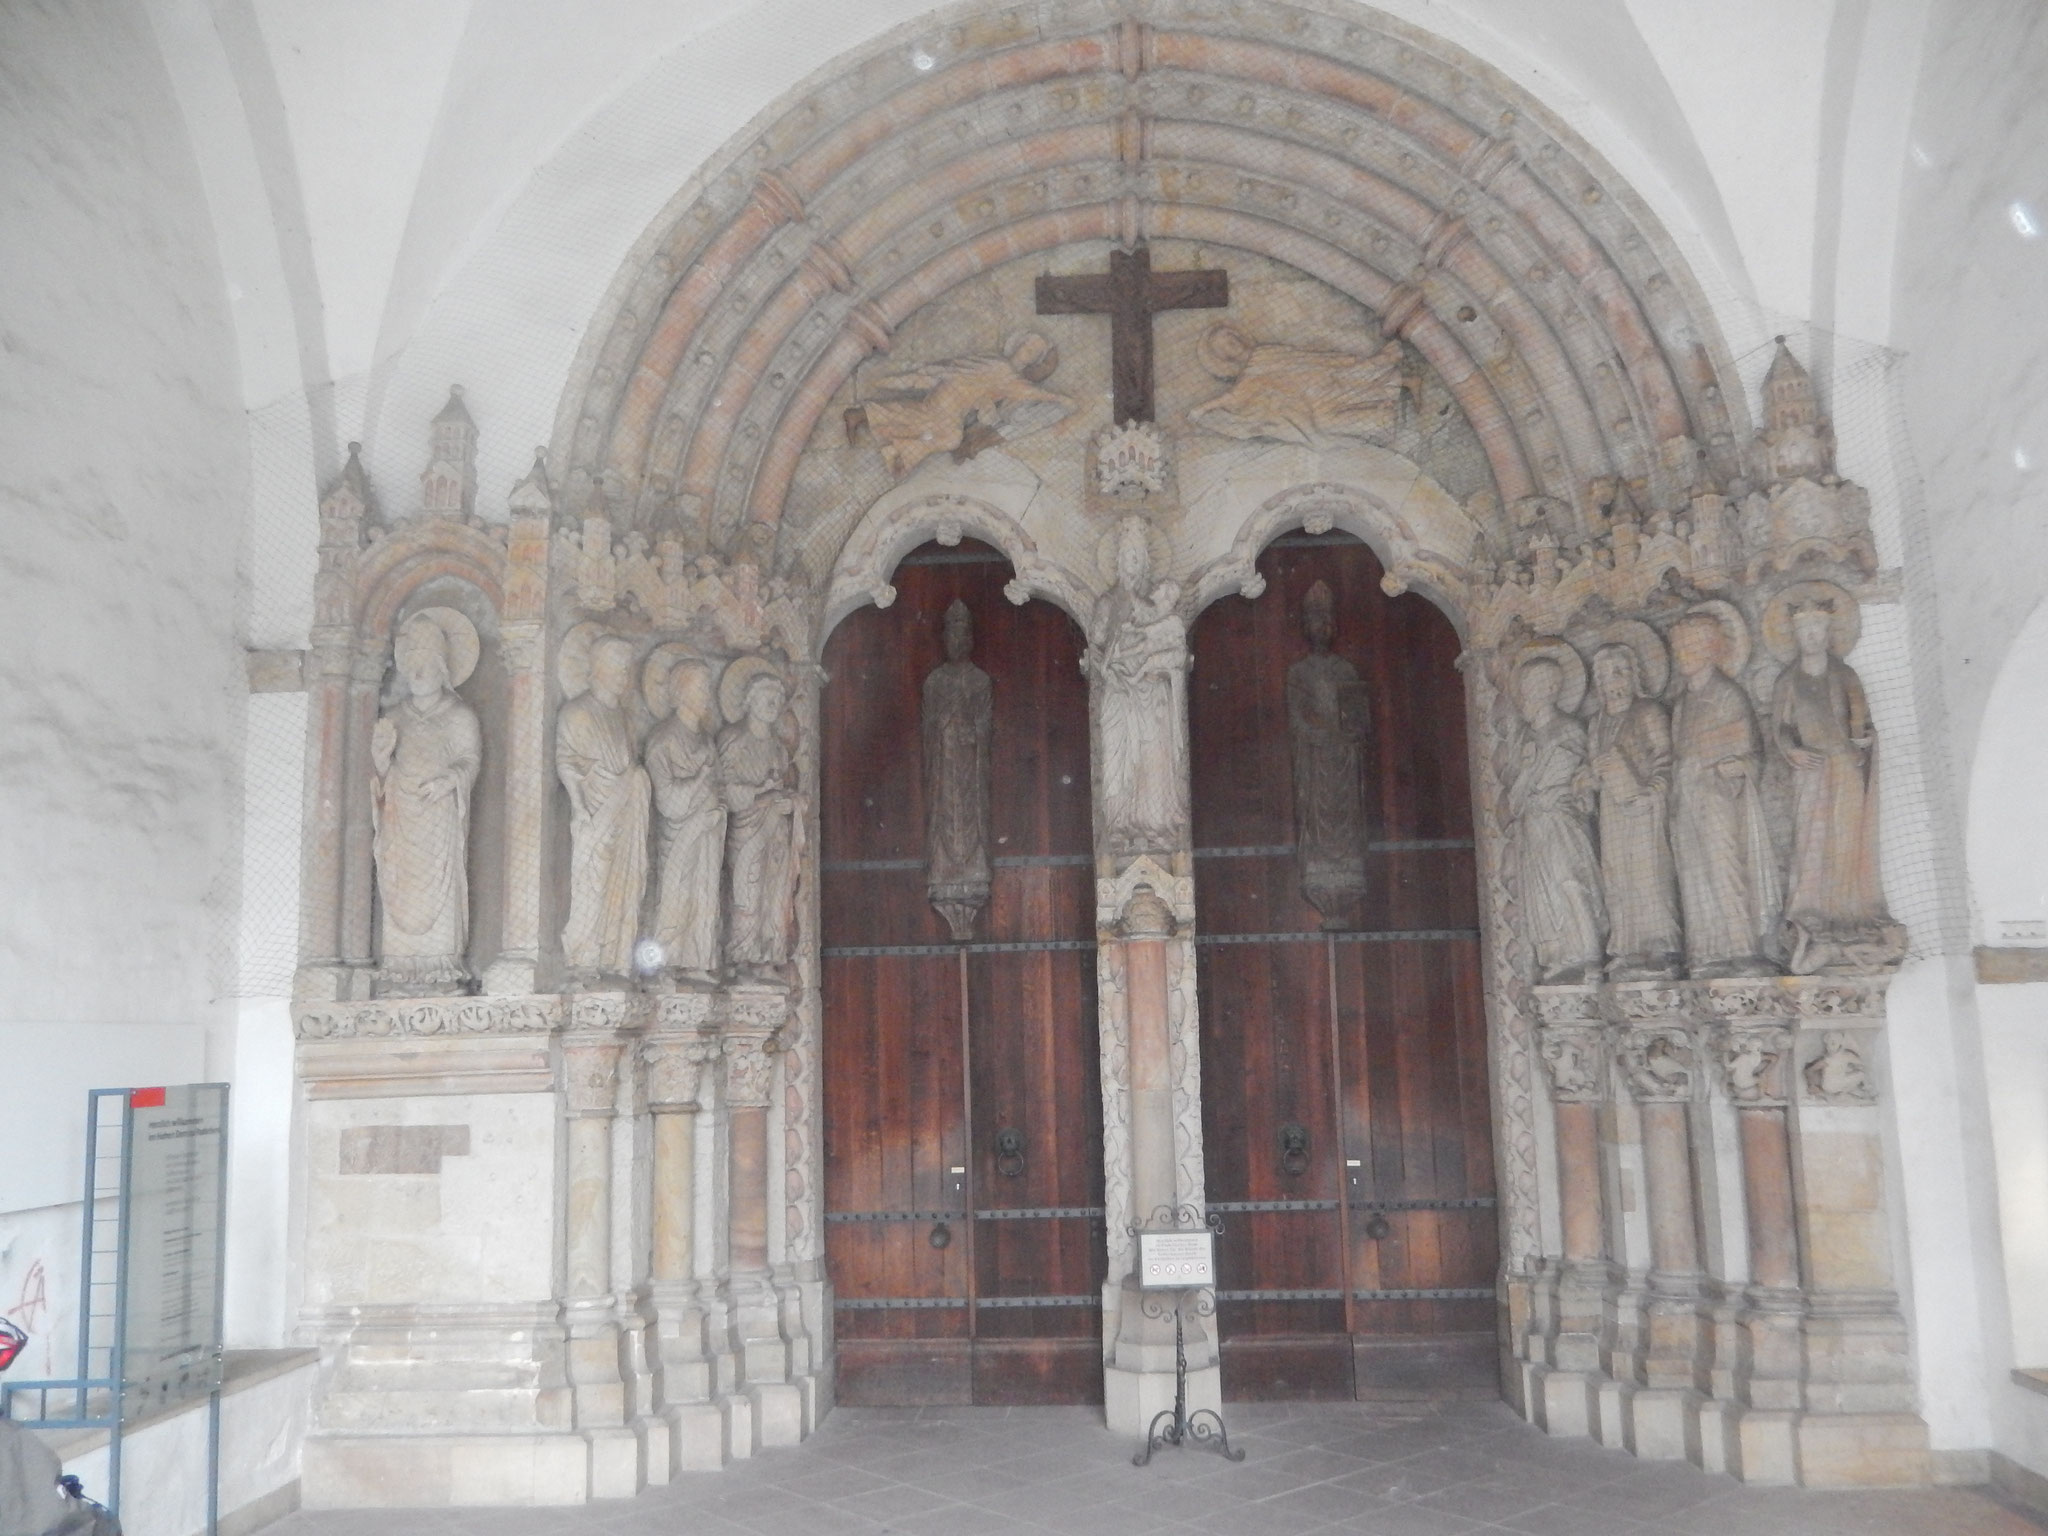 Paradiesportal des Paderborner Doms